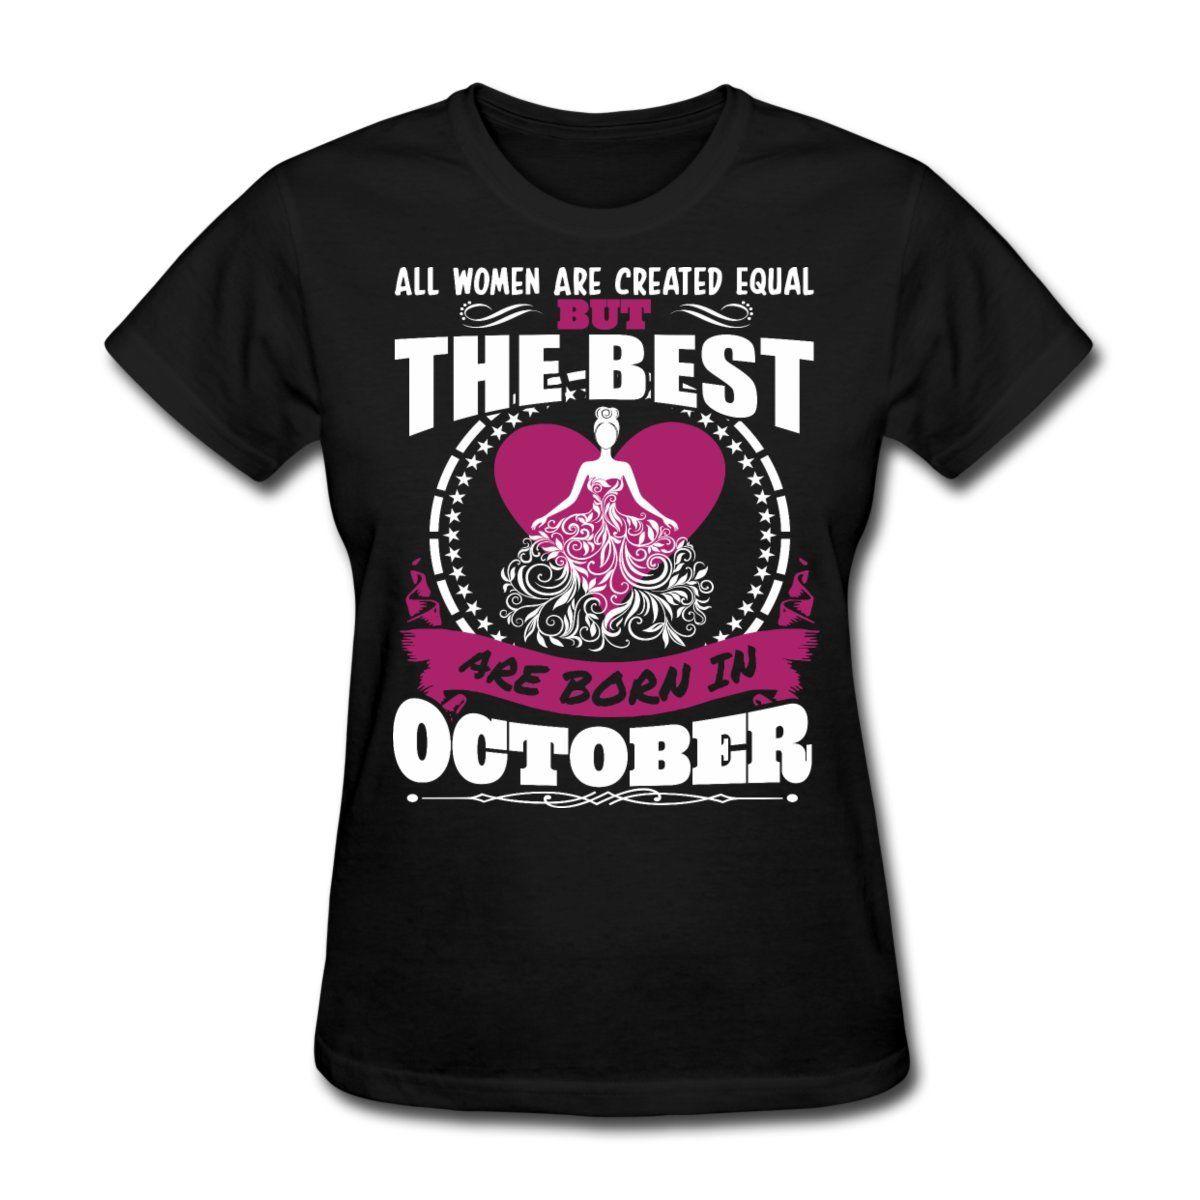 Desain t shirt kerah - Ulang Tahun Pada Bulan Oktober Diciptakan Sama Wanita T Shirt Desain T Shirt Lucu Tops